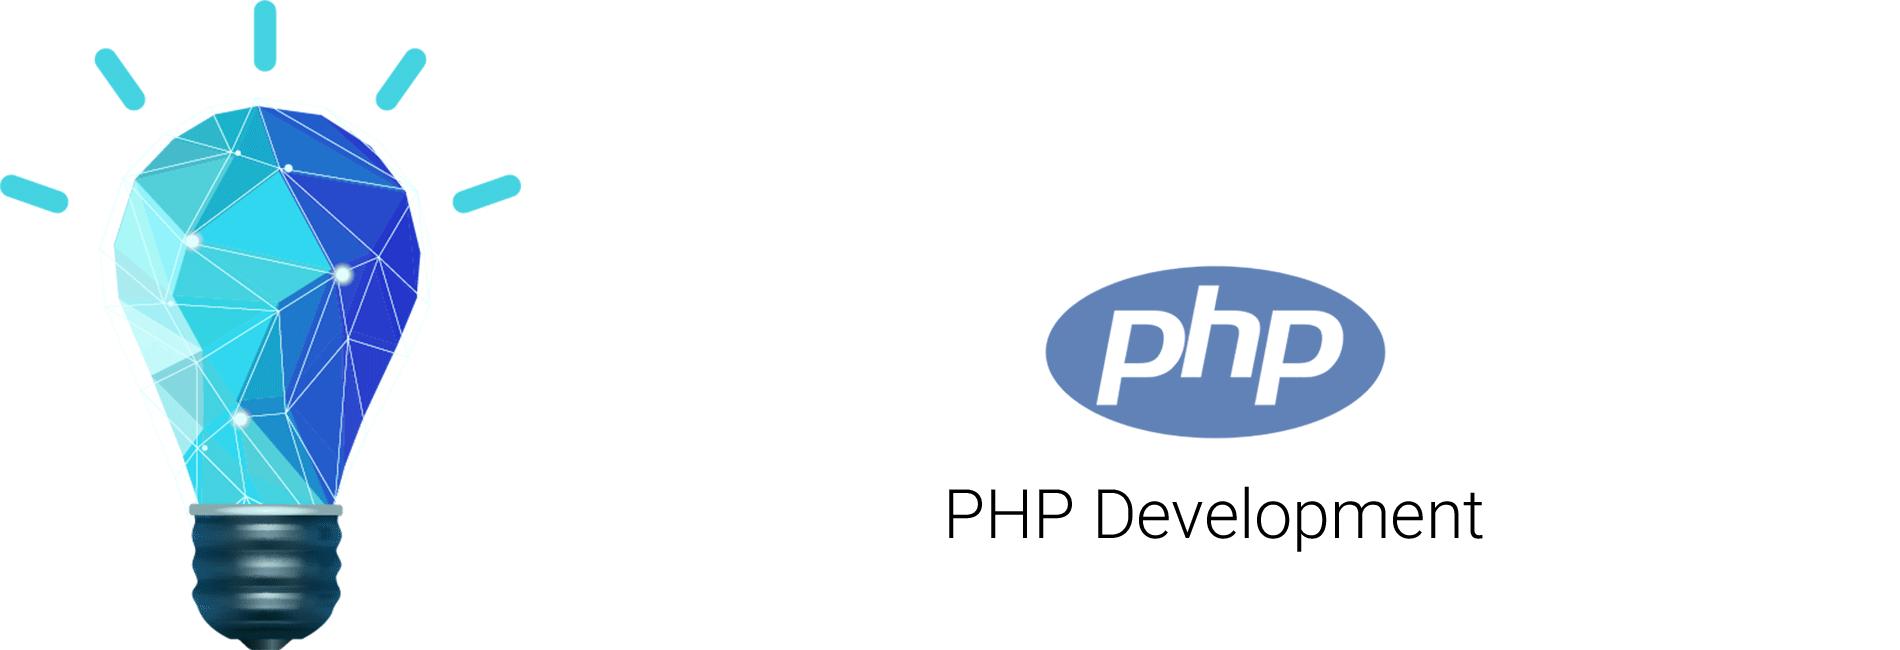 Php Development